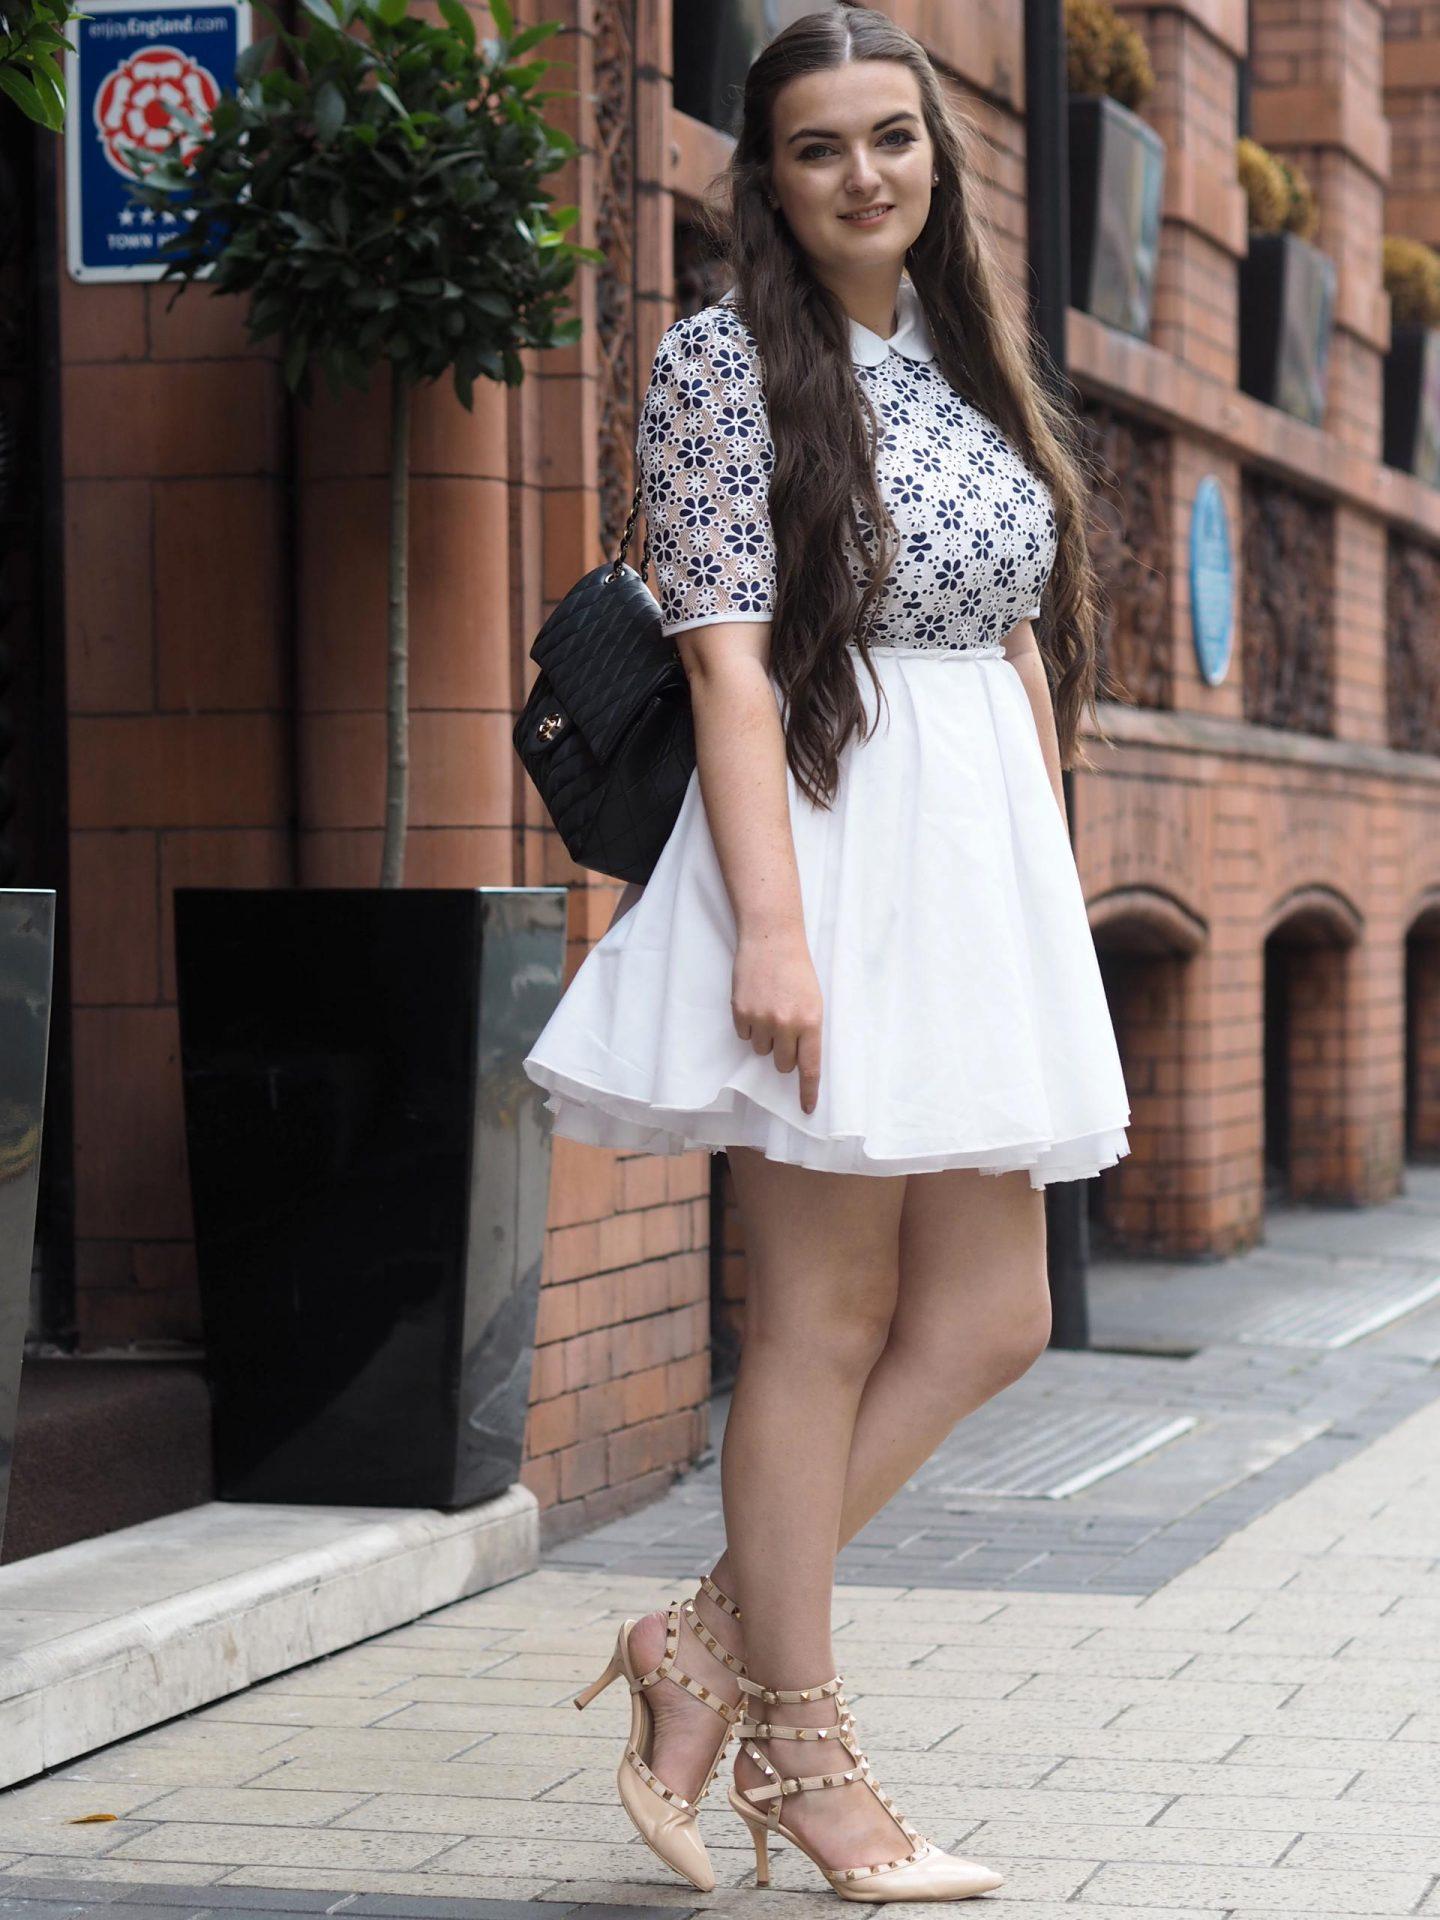 Summer Part Ready, Jones & Jones Audrey Dress - Rachel Nicole UK Style Blogger 2